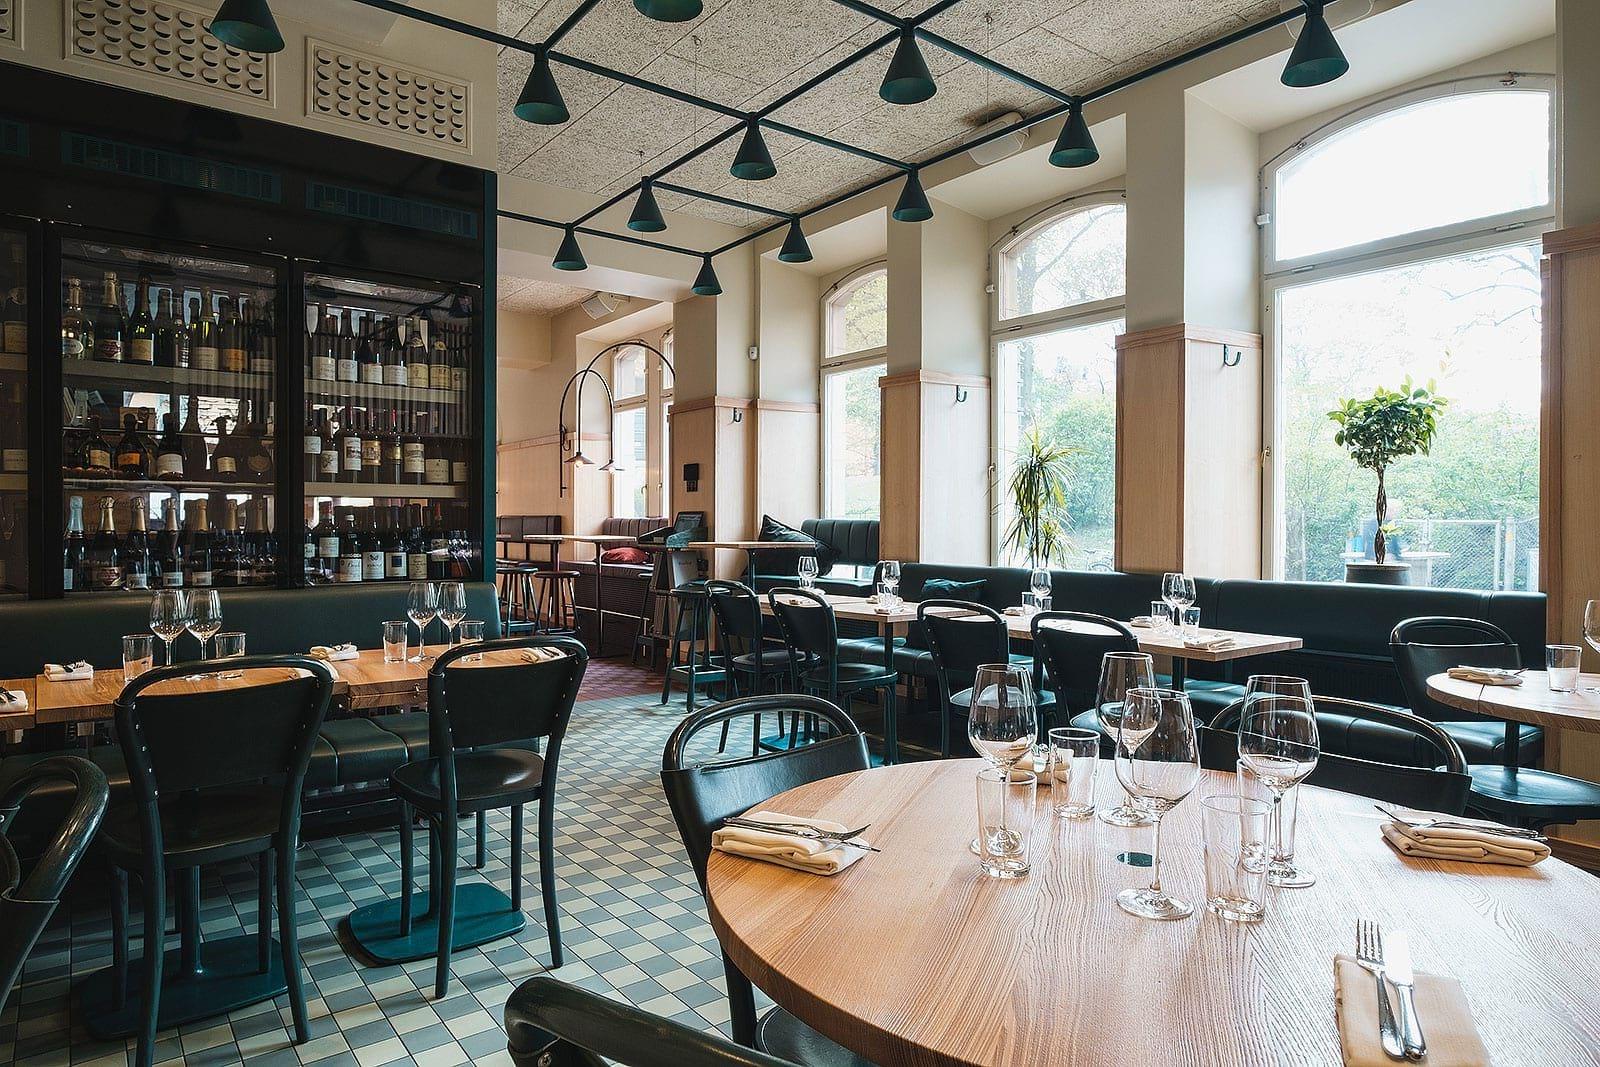 upplevelse restaurang stockholm